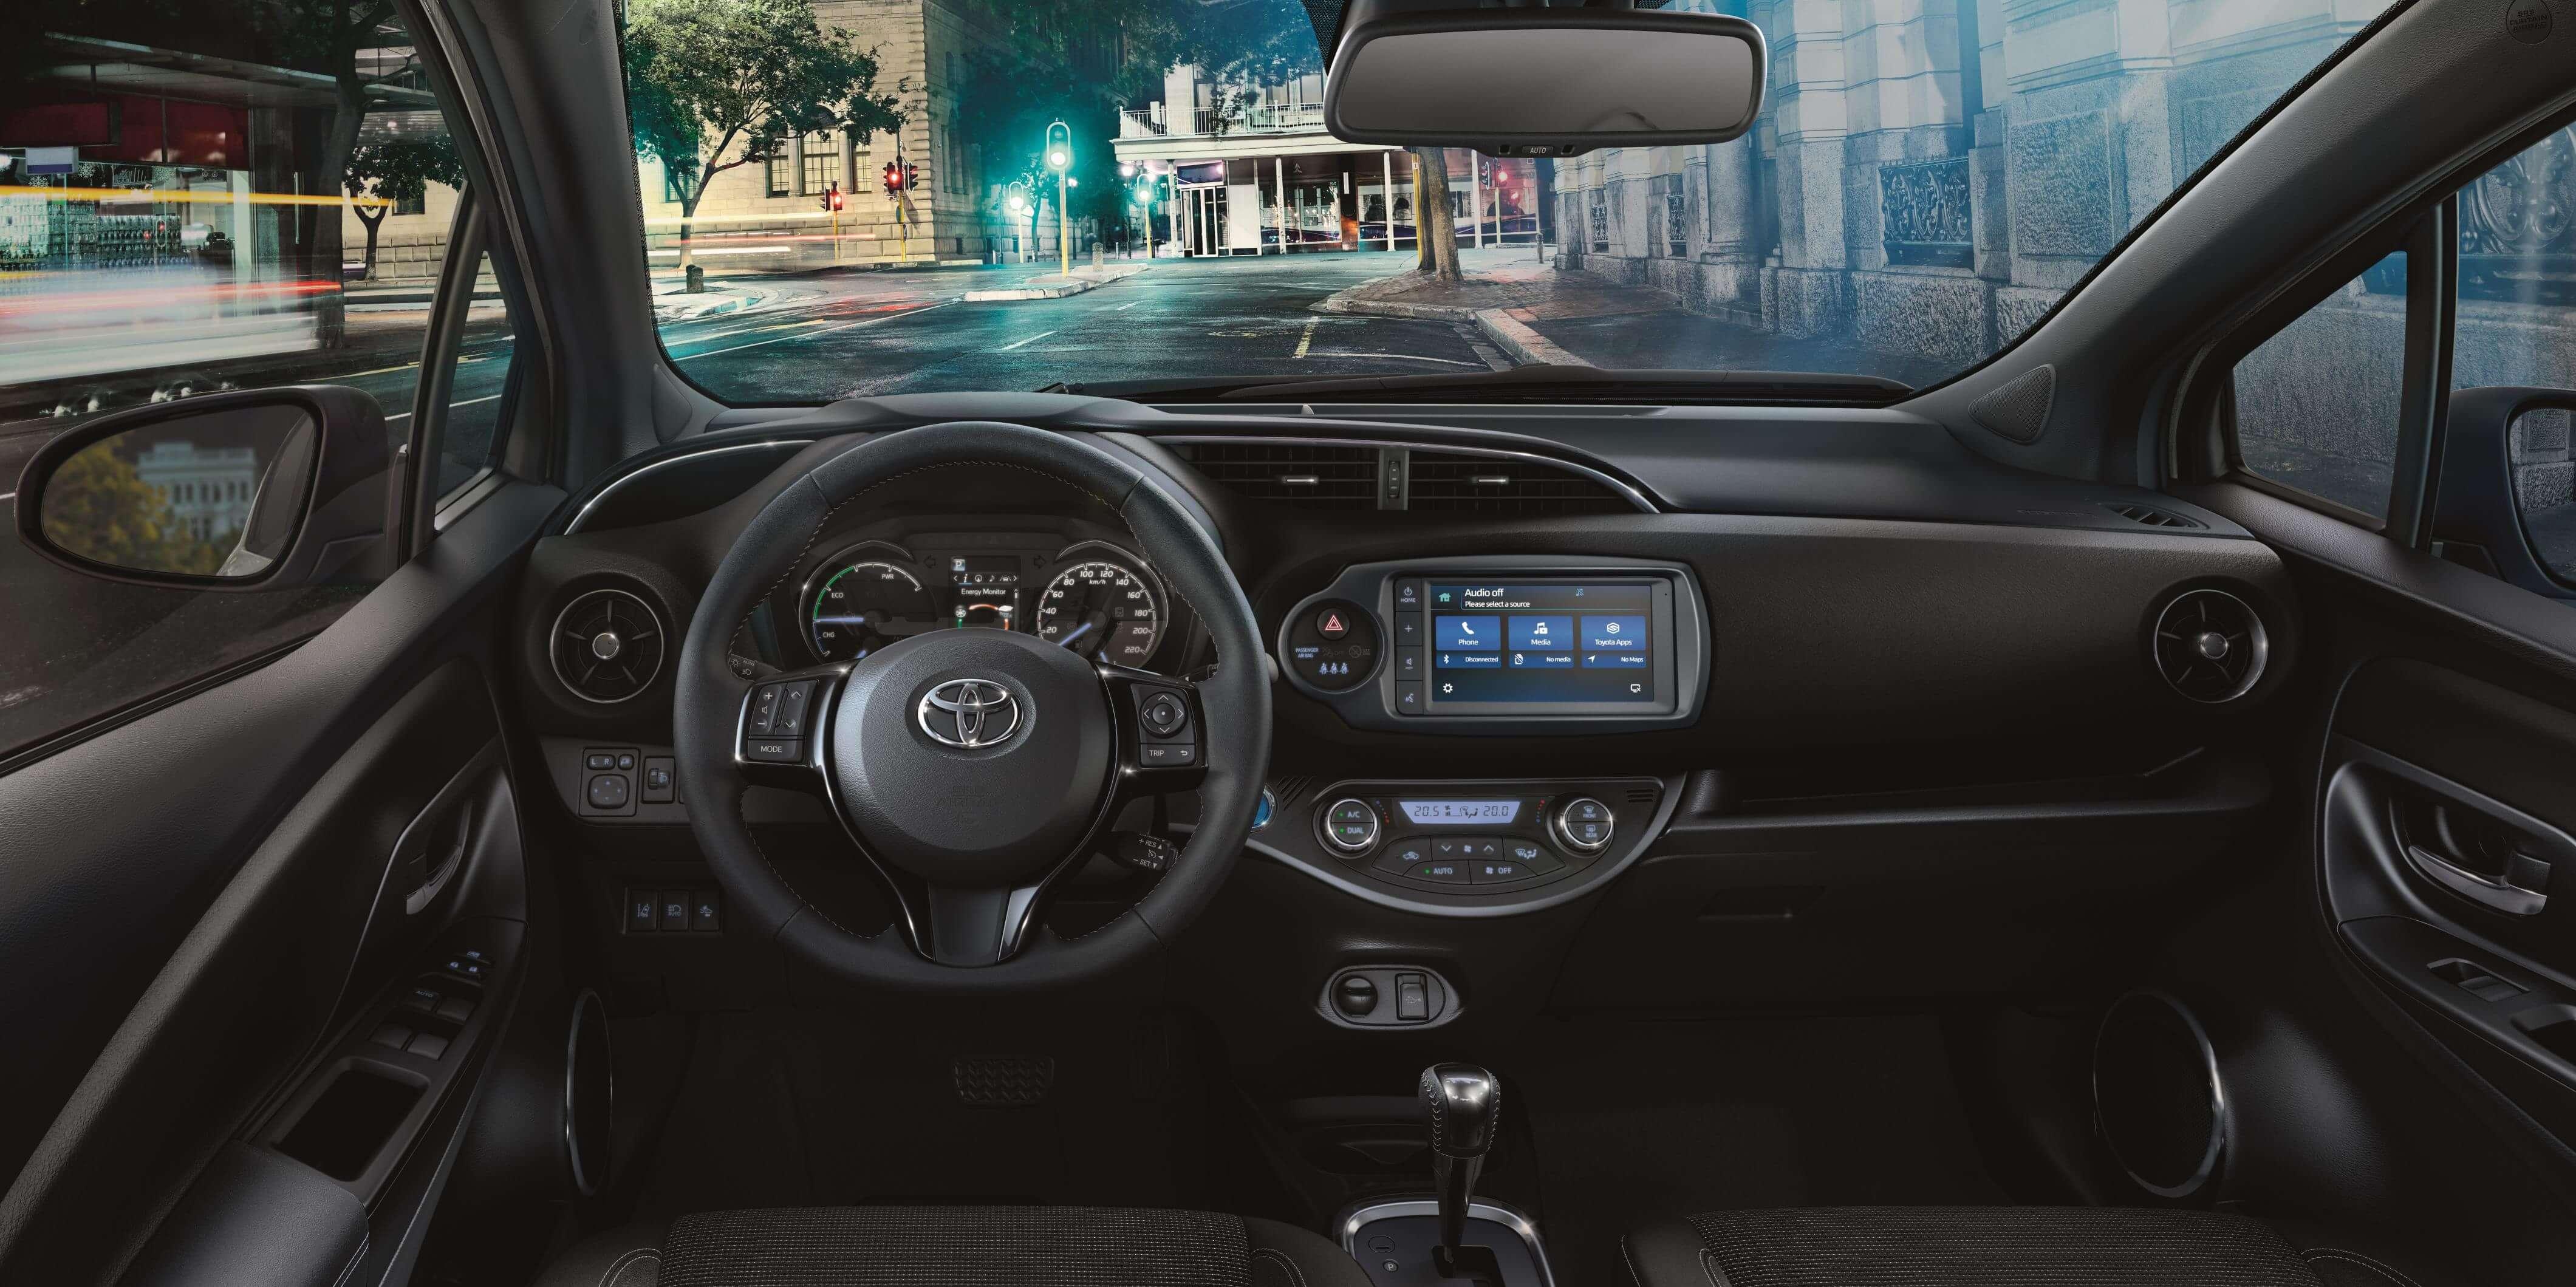 Toyota Yaris 2019: interior